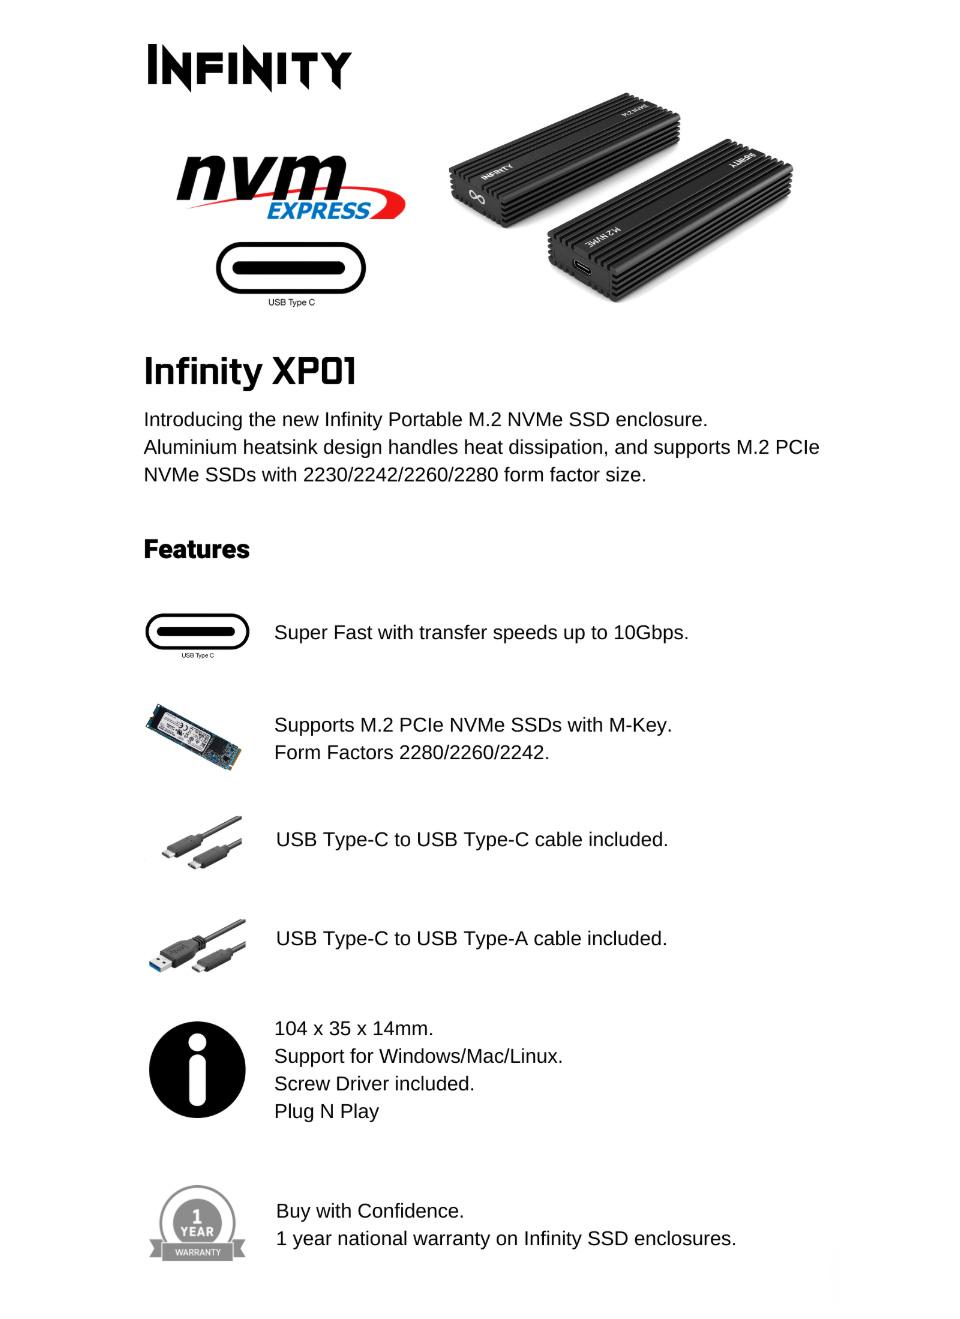 Infinity USB3.1 Type C NVME M.2 Enclosure Black features